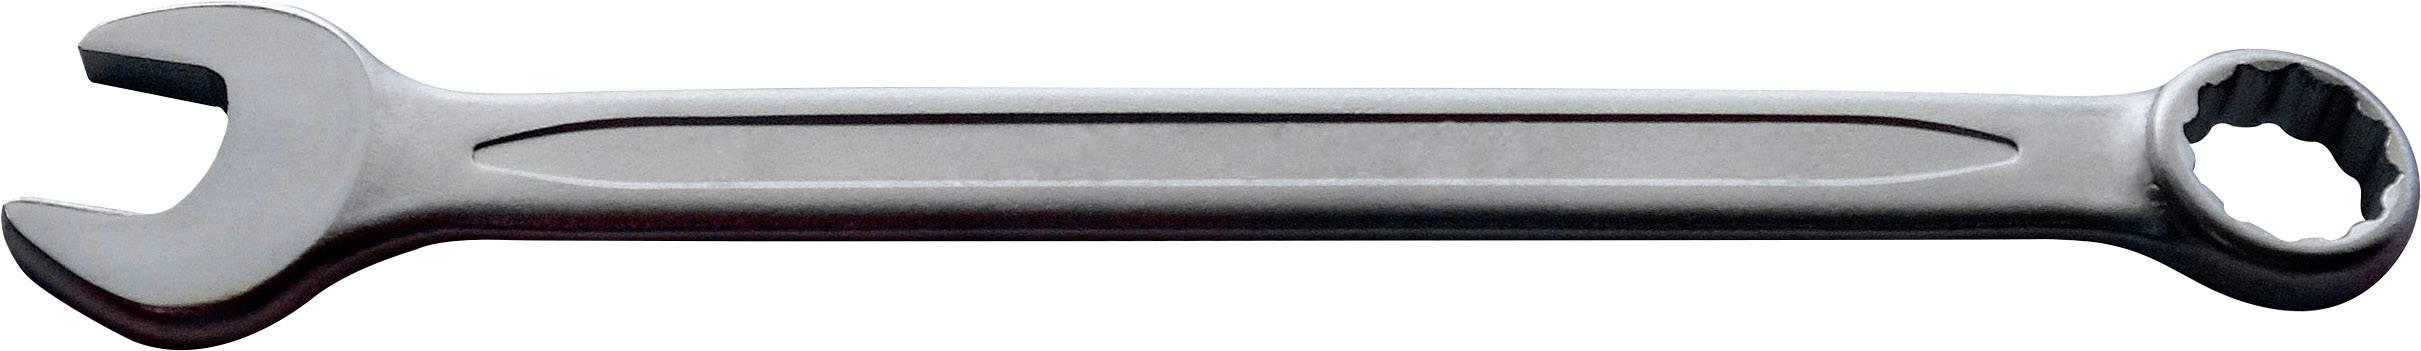 Očkoplochý kľúč/e TOOLCRAFT 820839, 19 mm